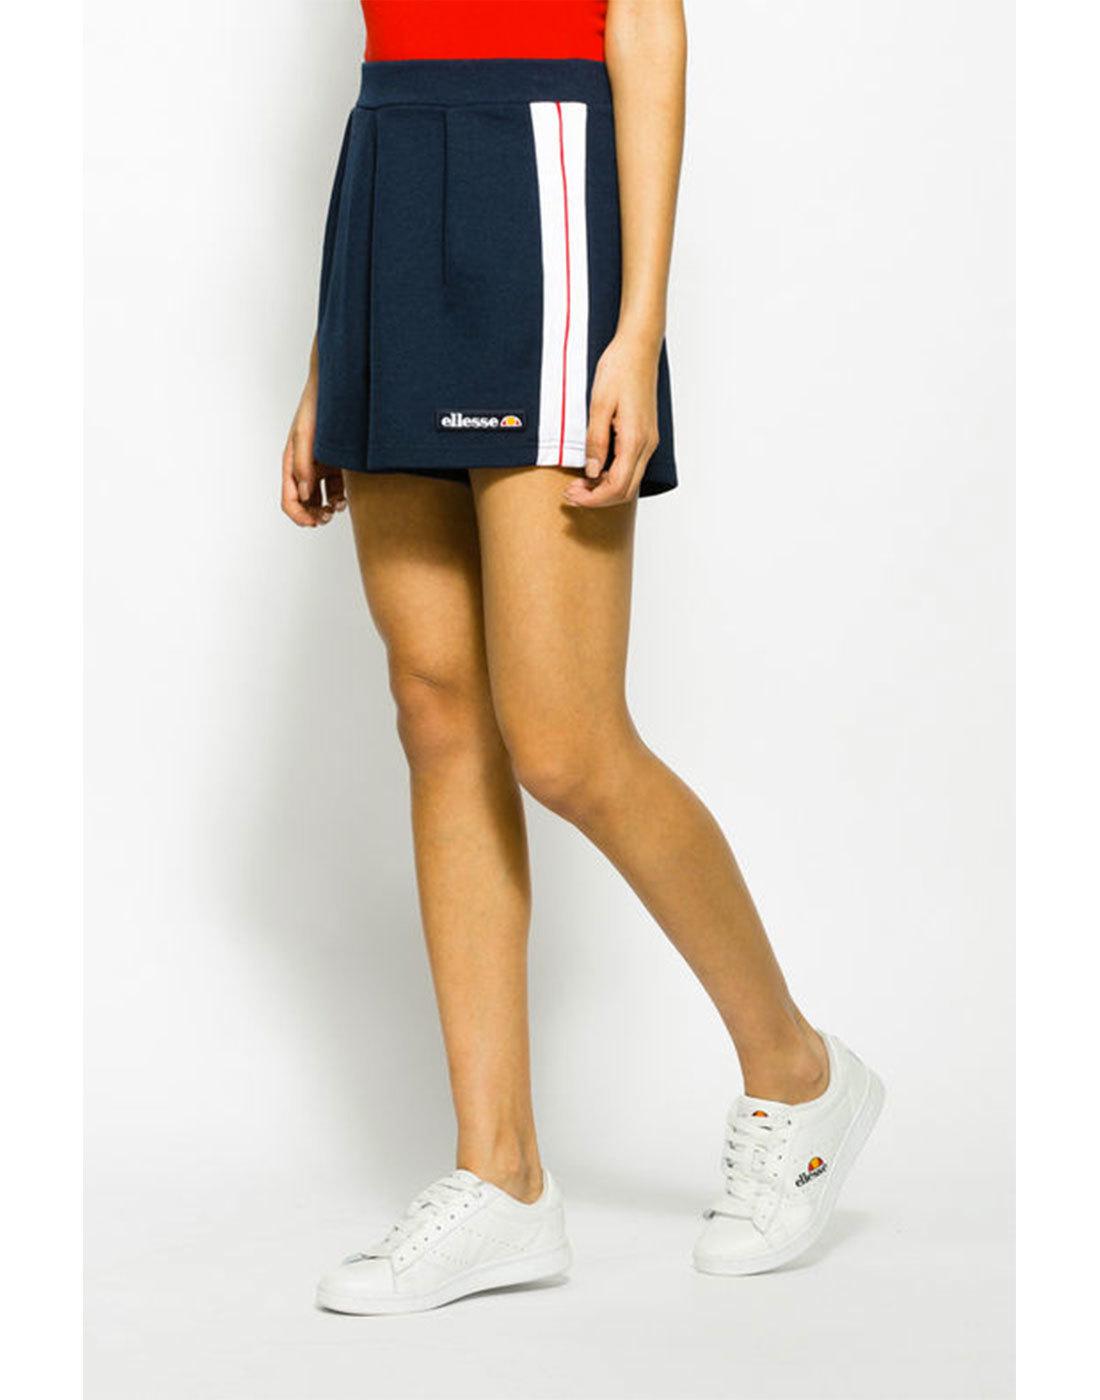 Sassi ELLESSE WOMENS Retro 70s Shorts Dress Blues